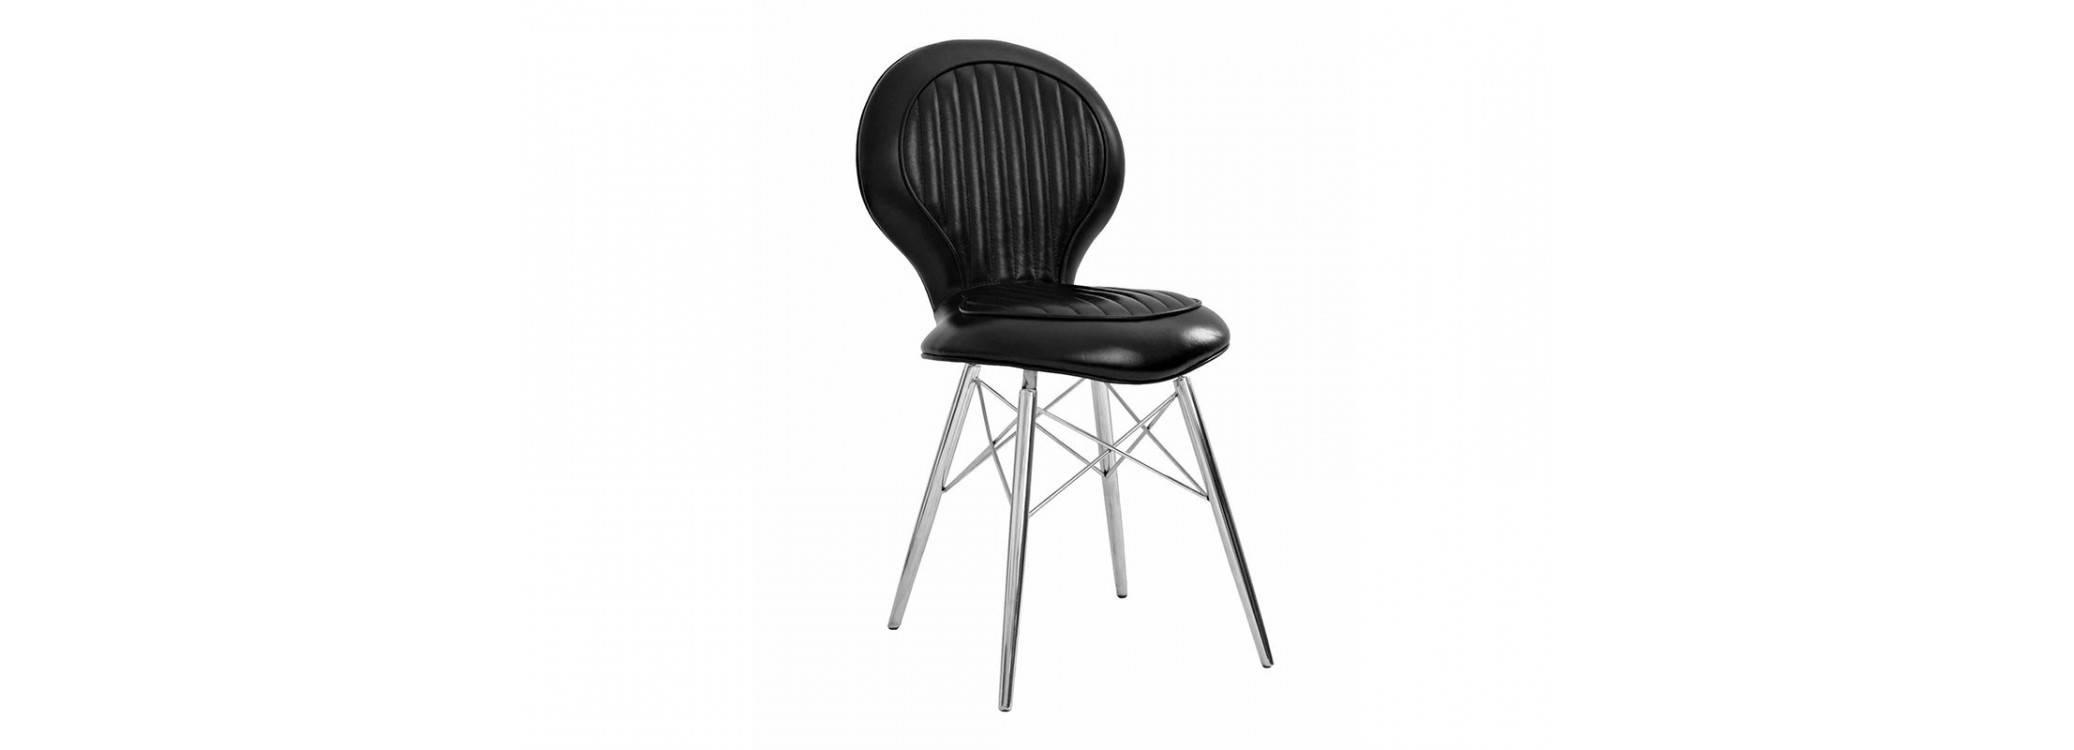 Aviator chair - Black leather